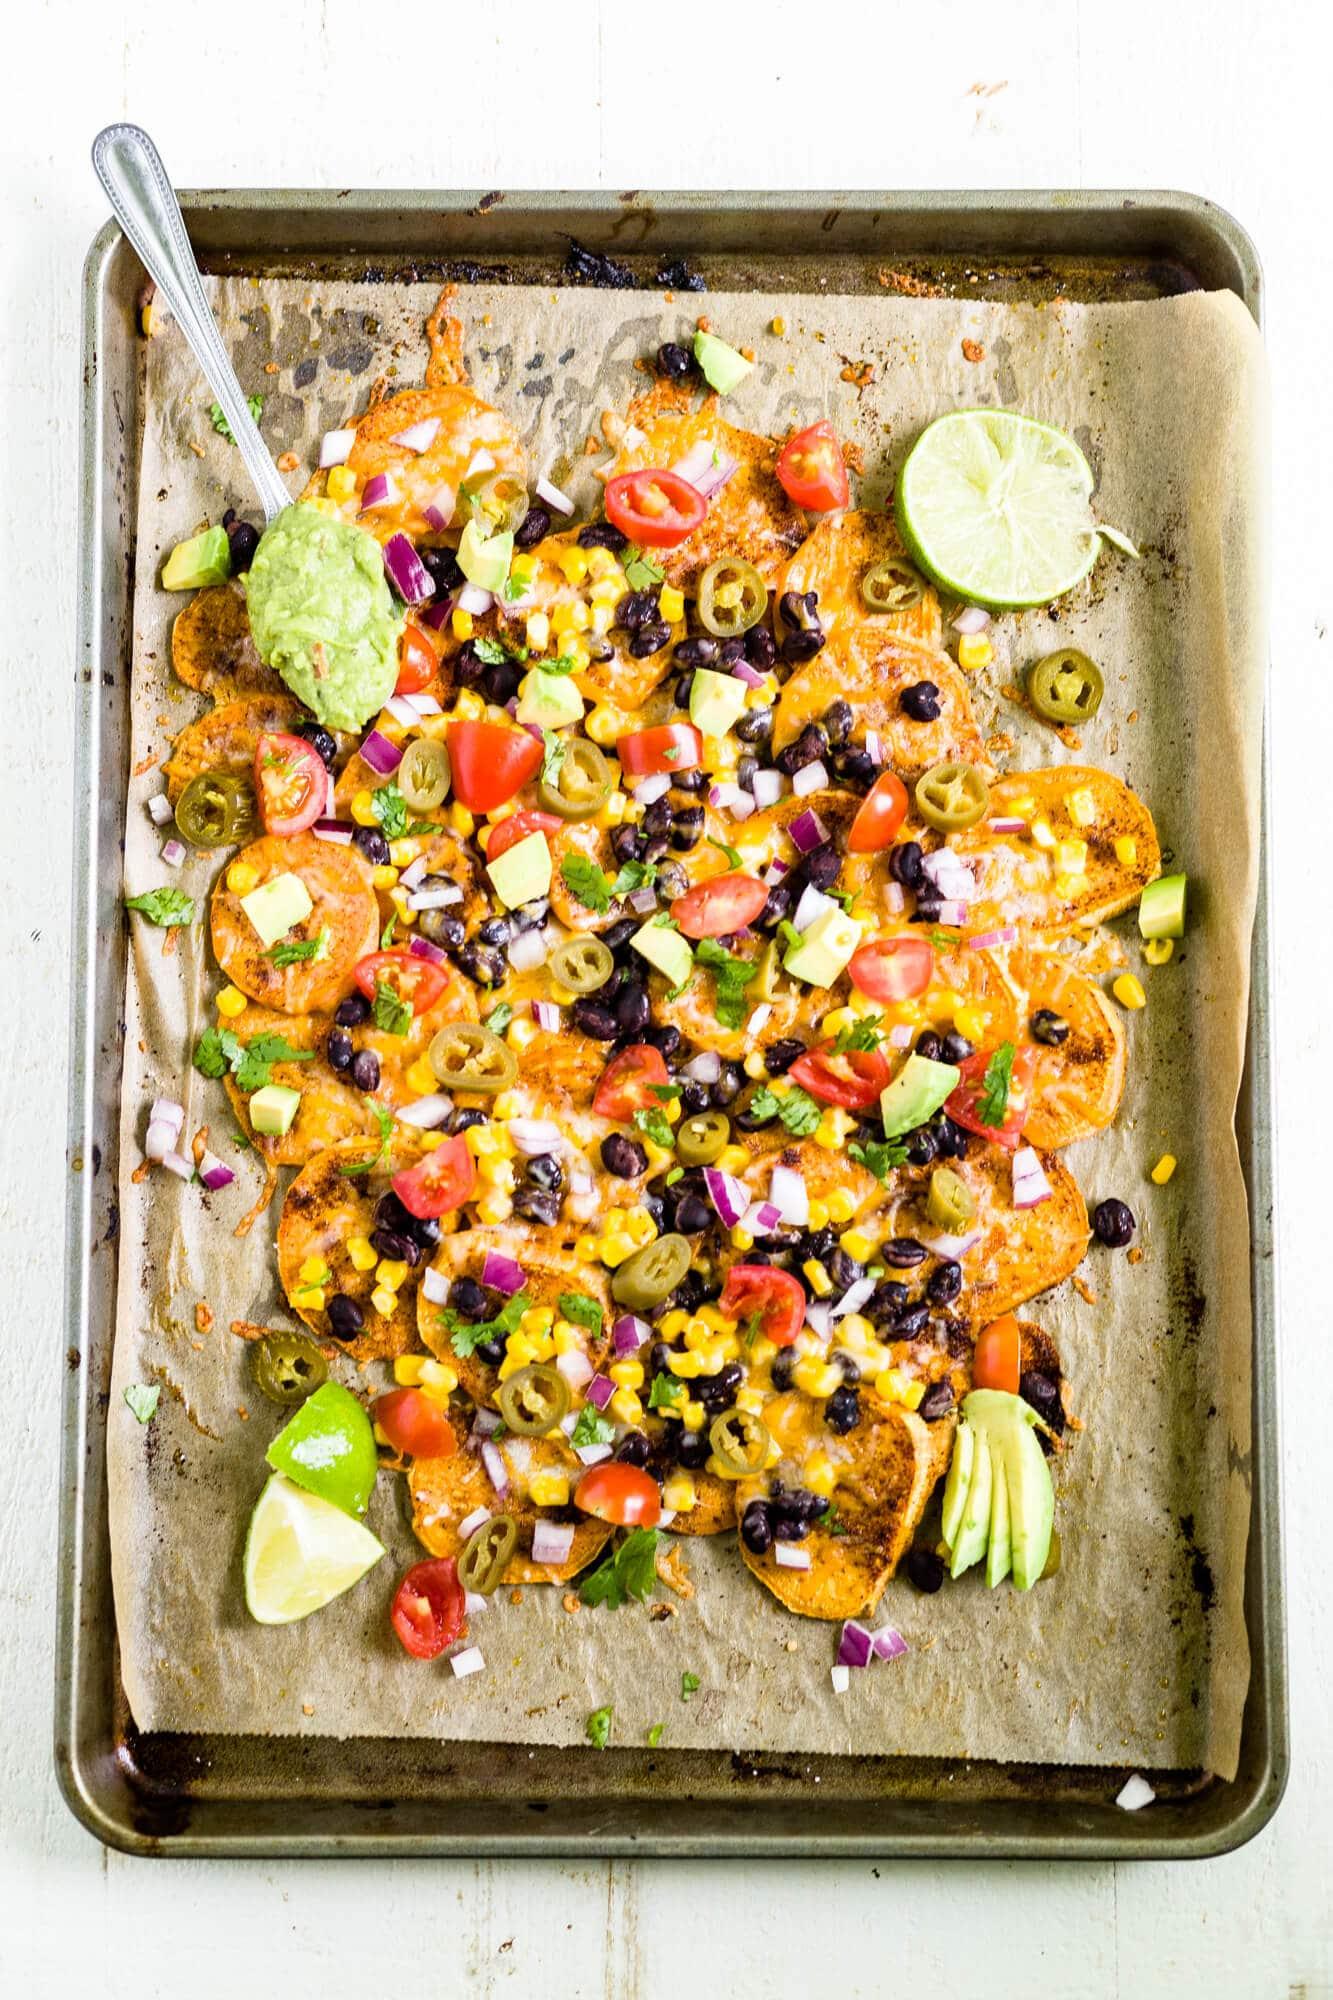 sweet potato nachos on a sheet pan topped with jalapenos, corn, beans, avocado, tomatoes and cilantro